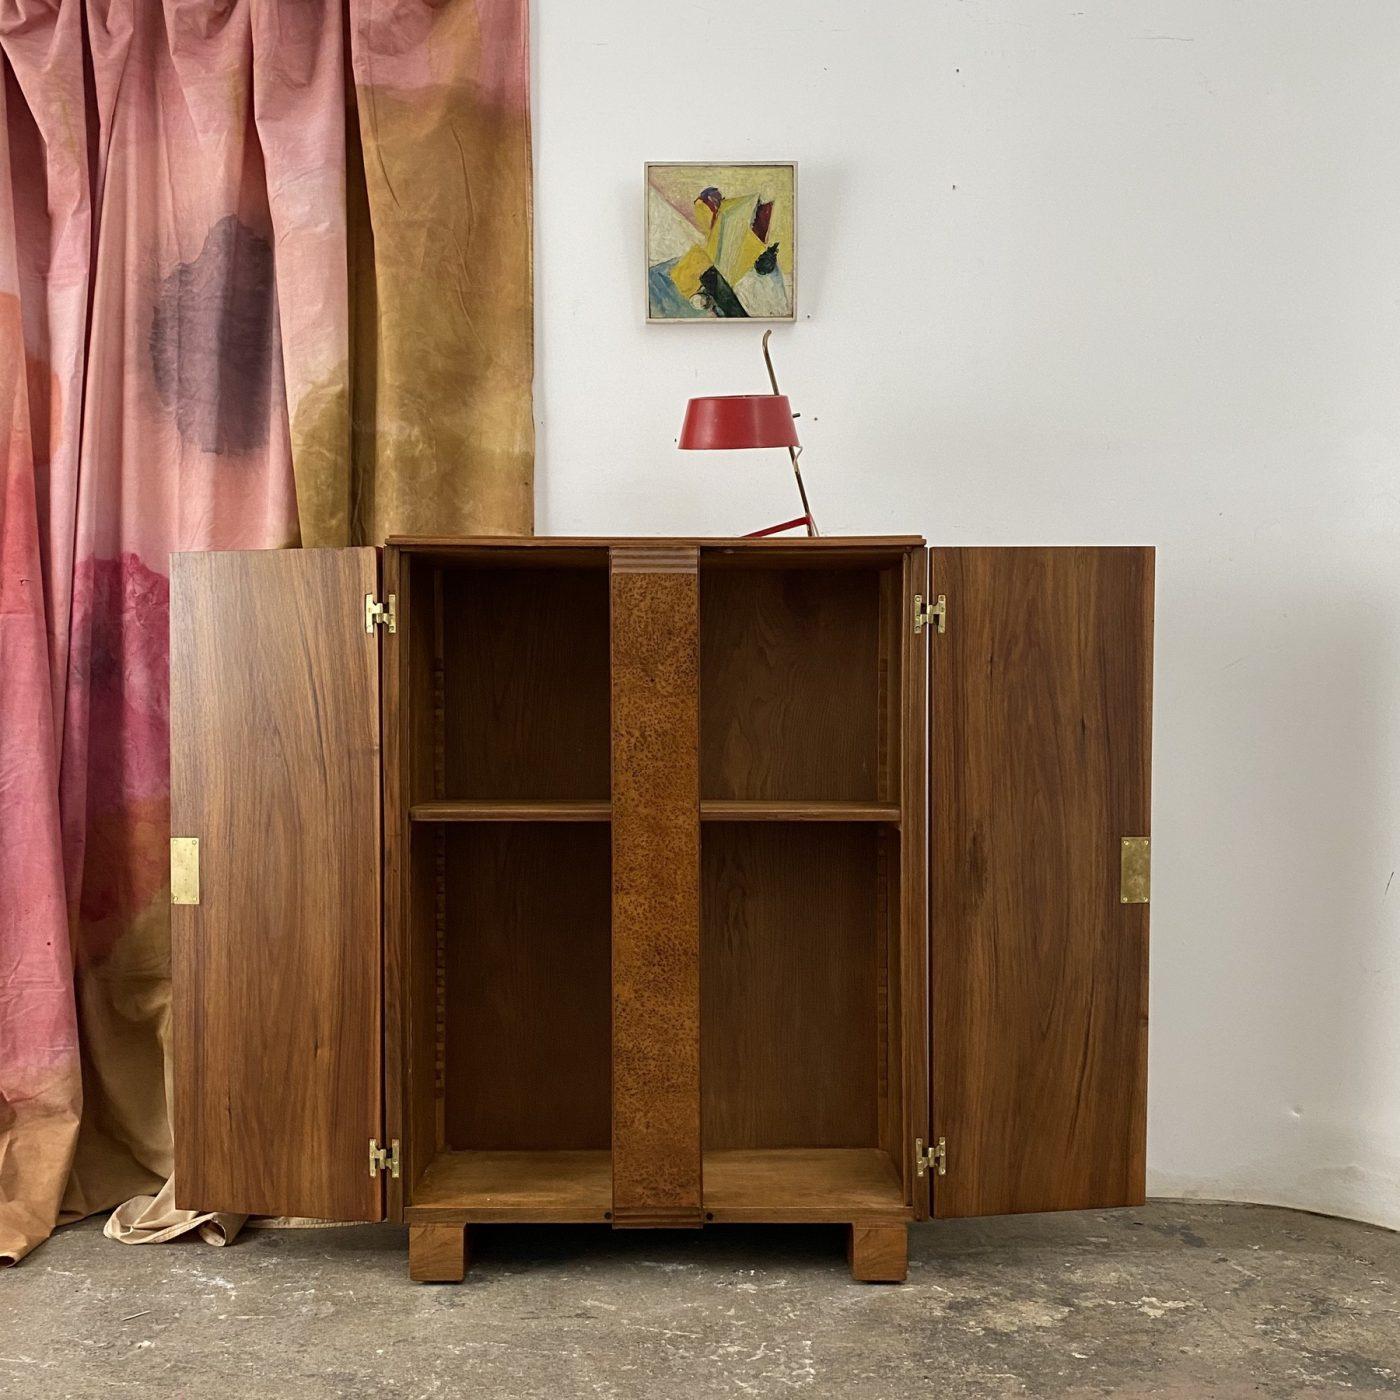 objet-vagabond-artdeco-cabinet0001